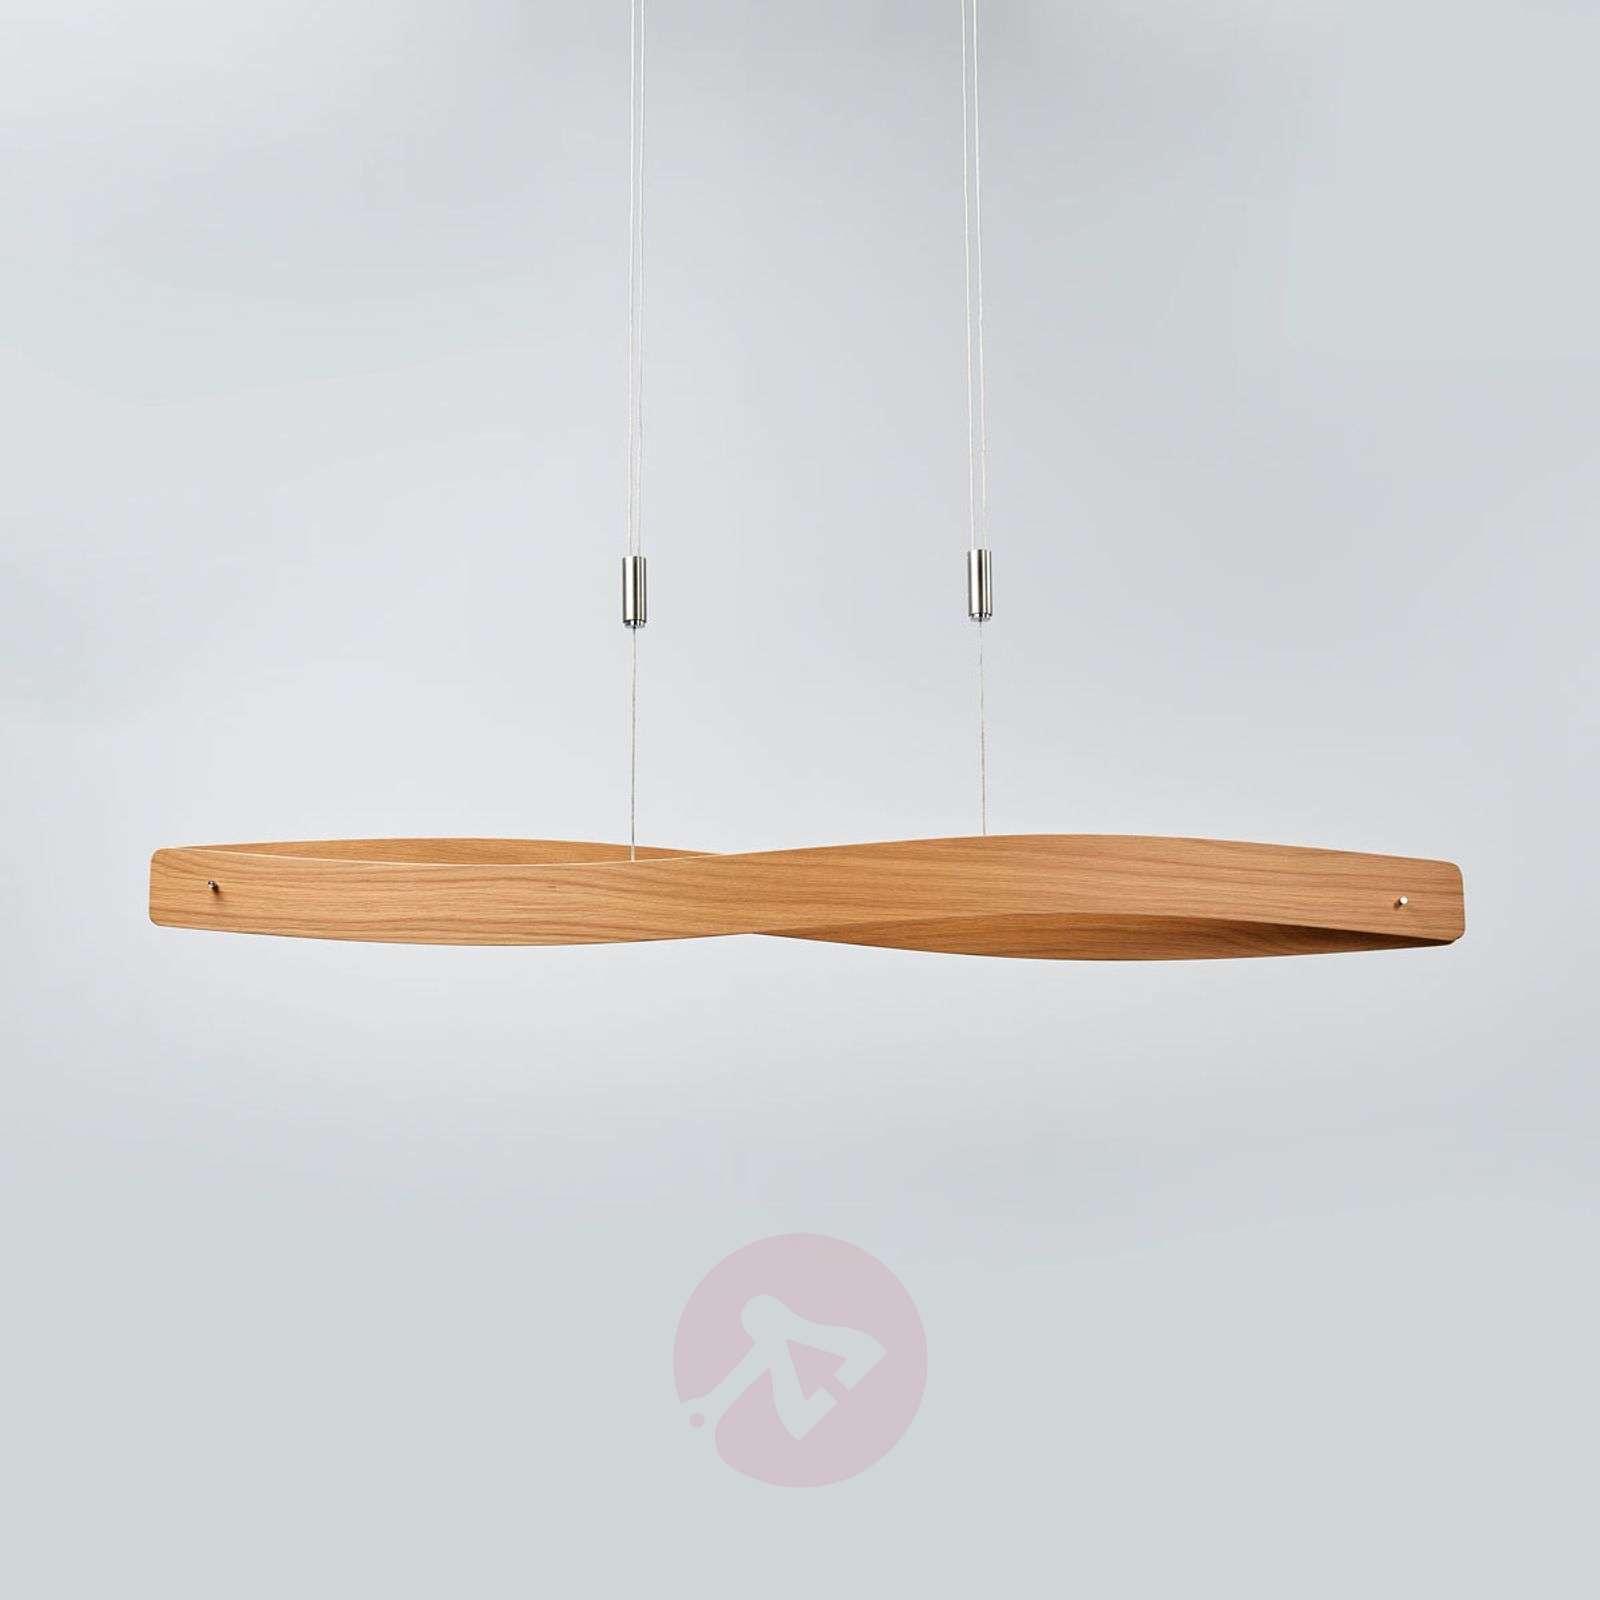 wood veneer lighting. Lian LED Hanging Light With Wood Veneer-6722424-01 Veneer Lighting